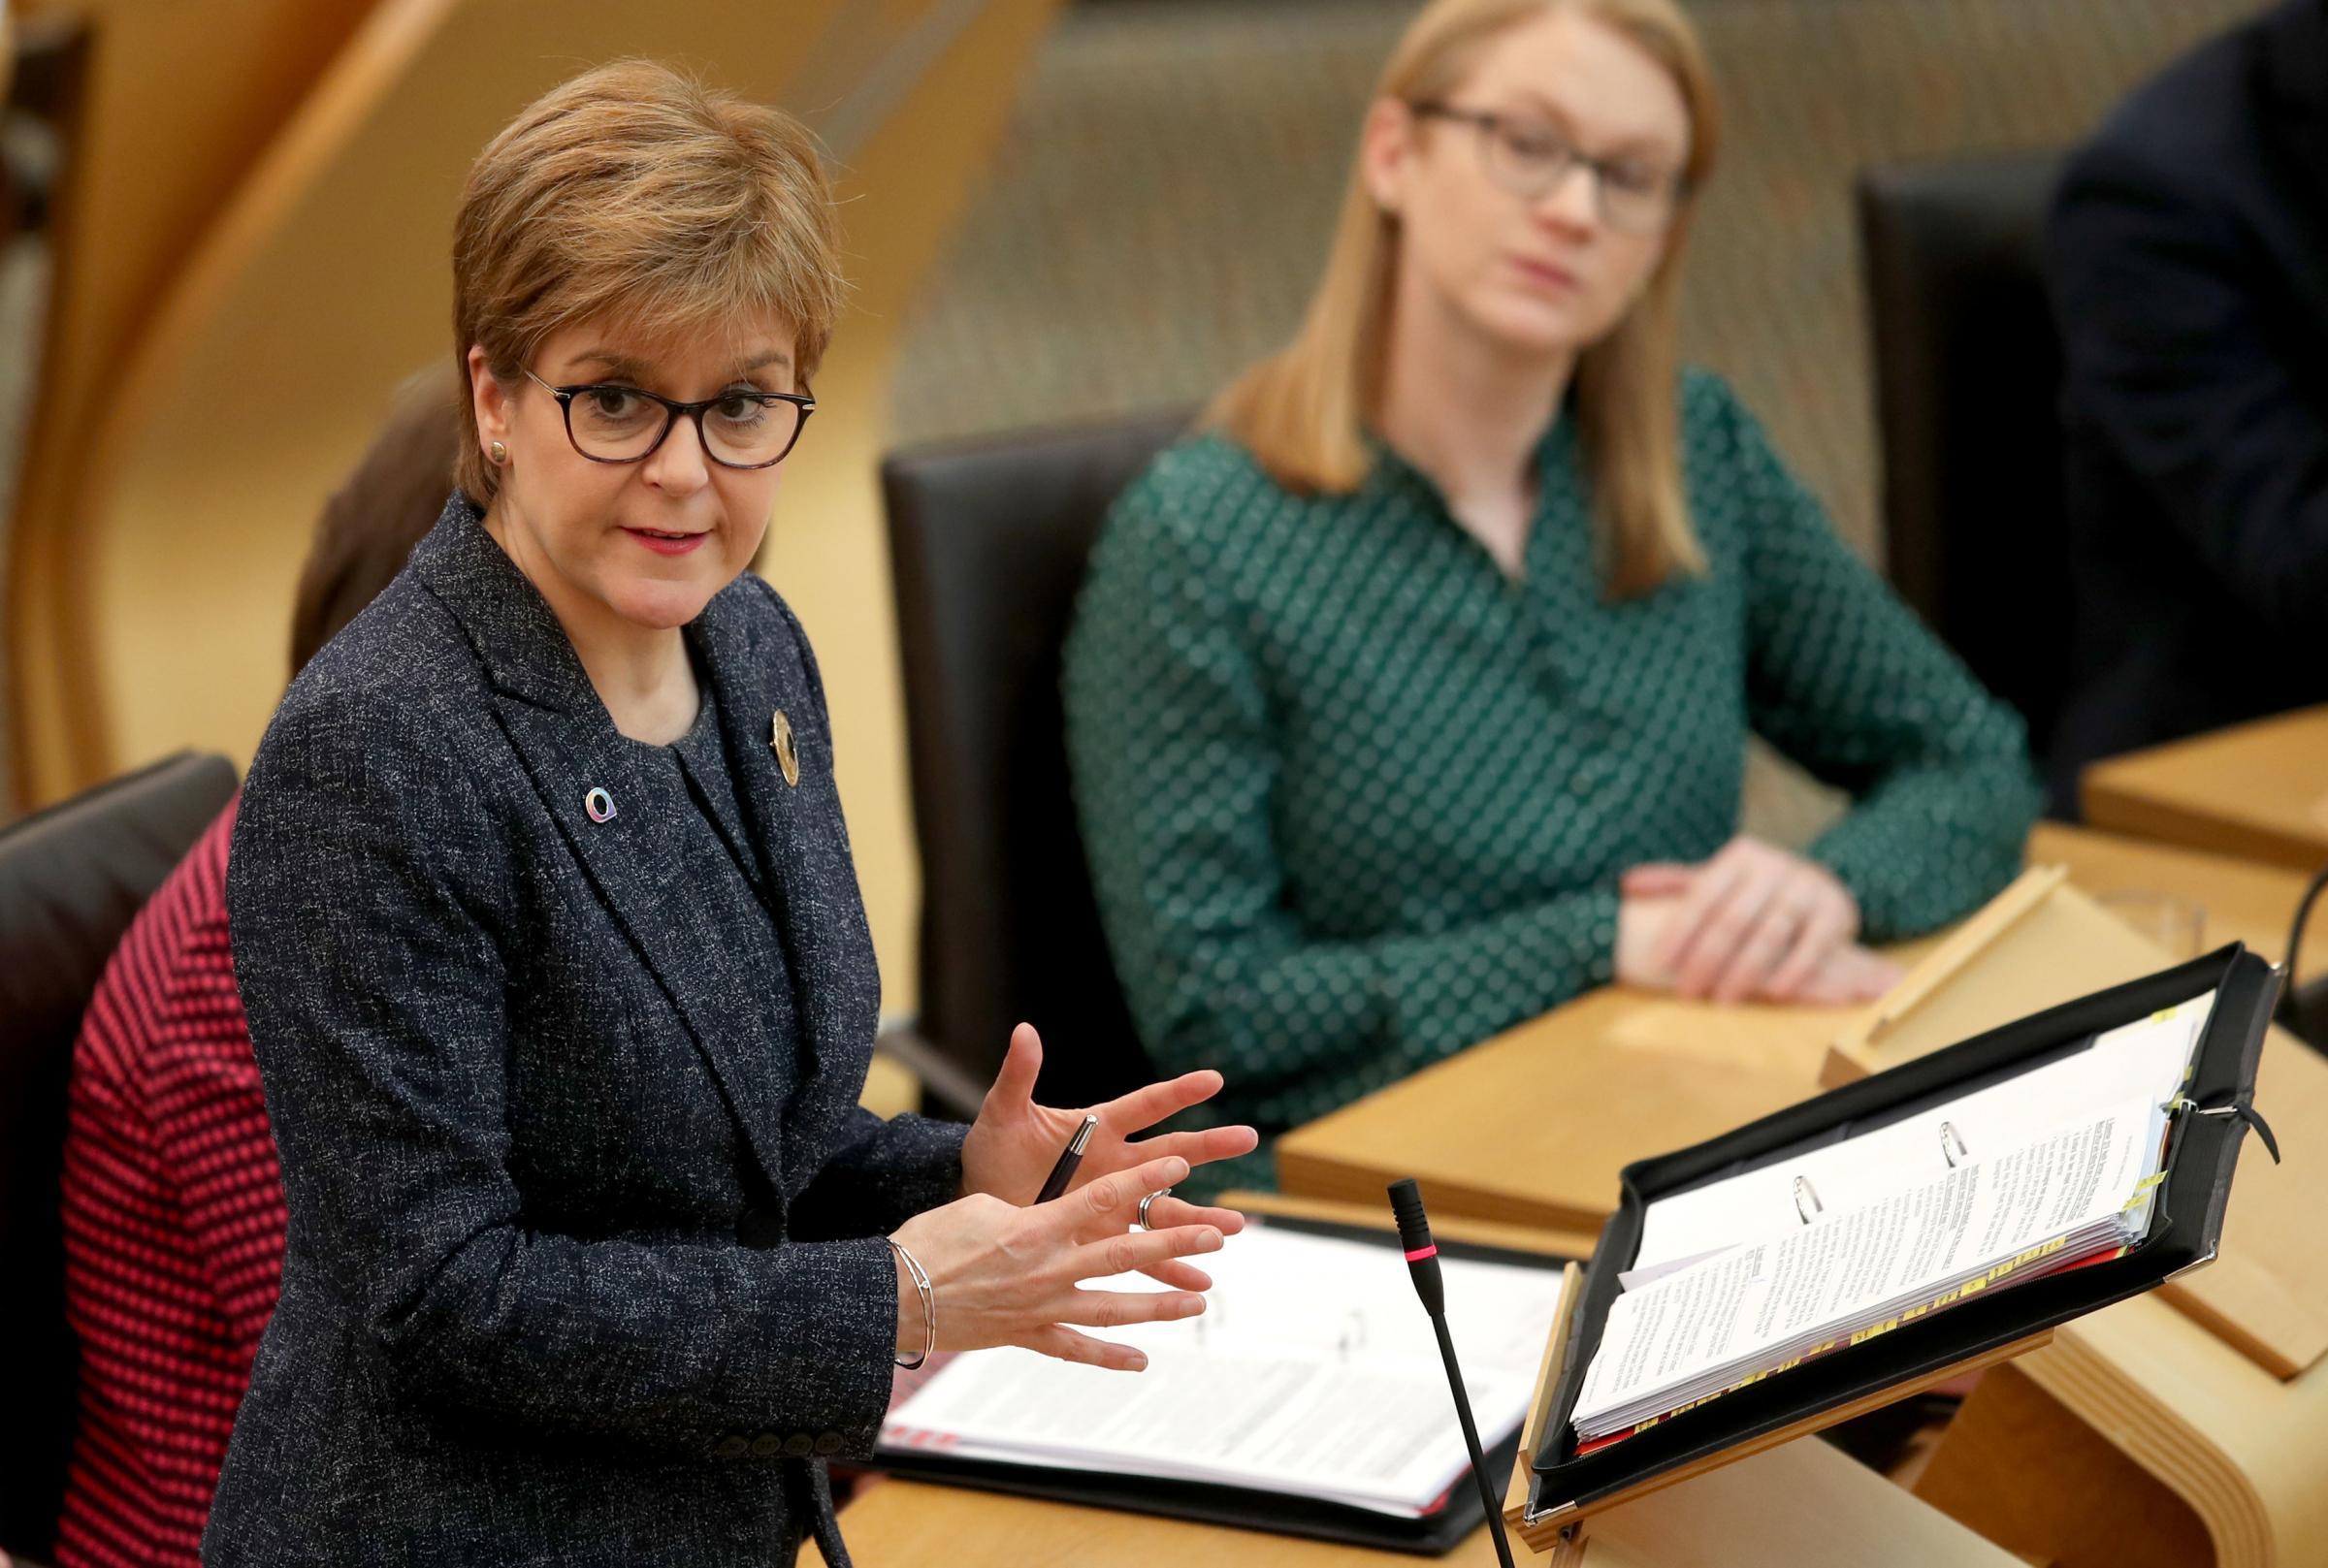 FMQs: Nicola Sturgeon has her say on Glasgow Lord Provost